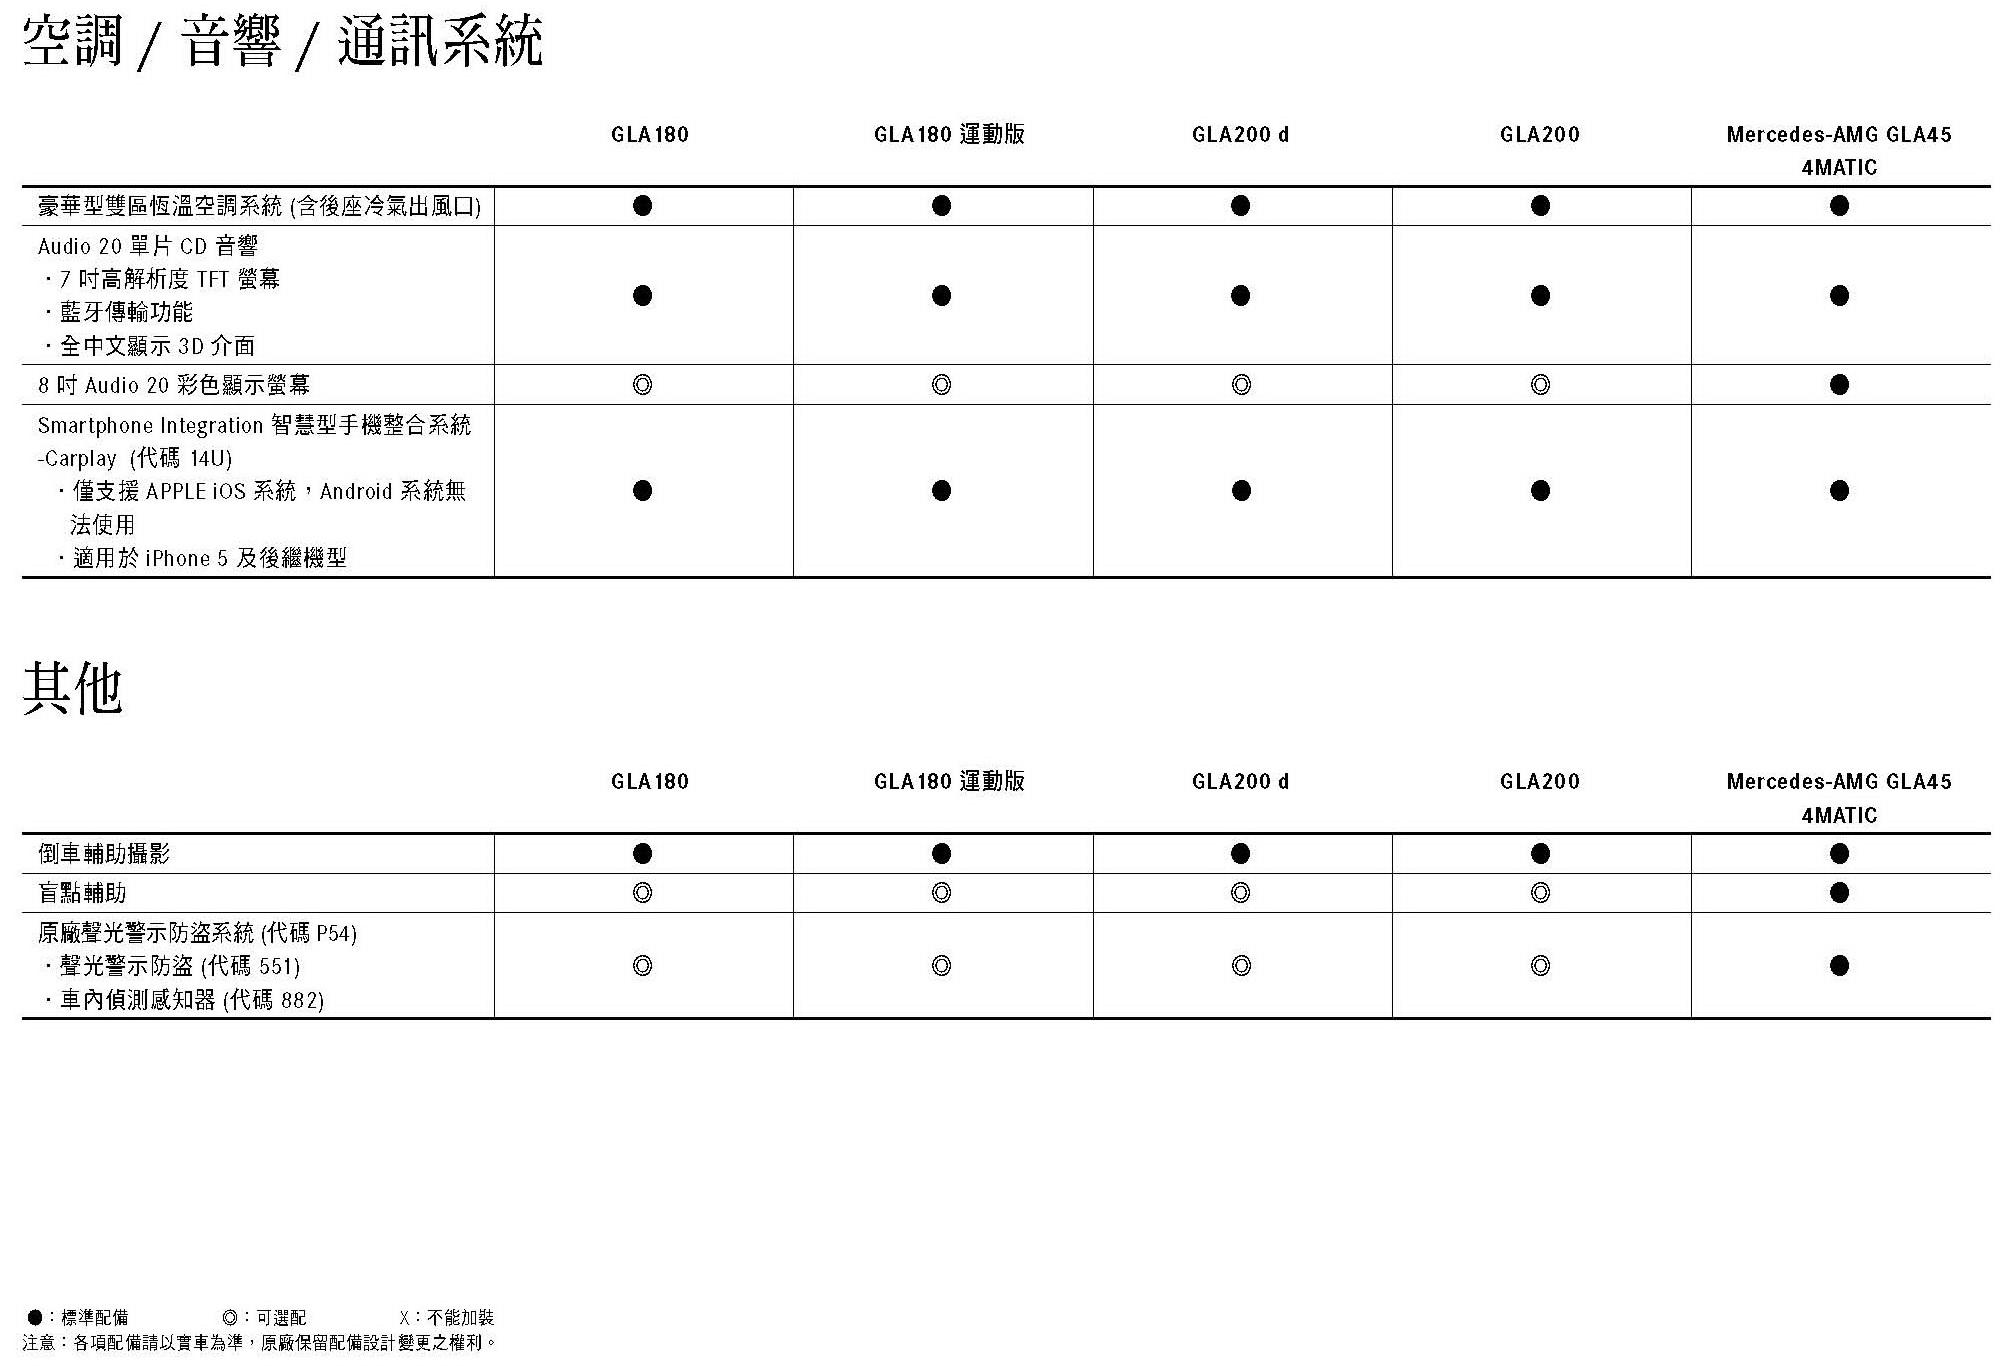 MY1718 GLA規格配備表20170510_final_頁面_10